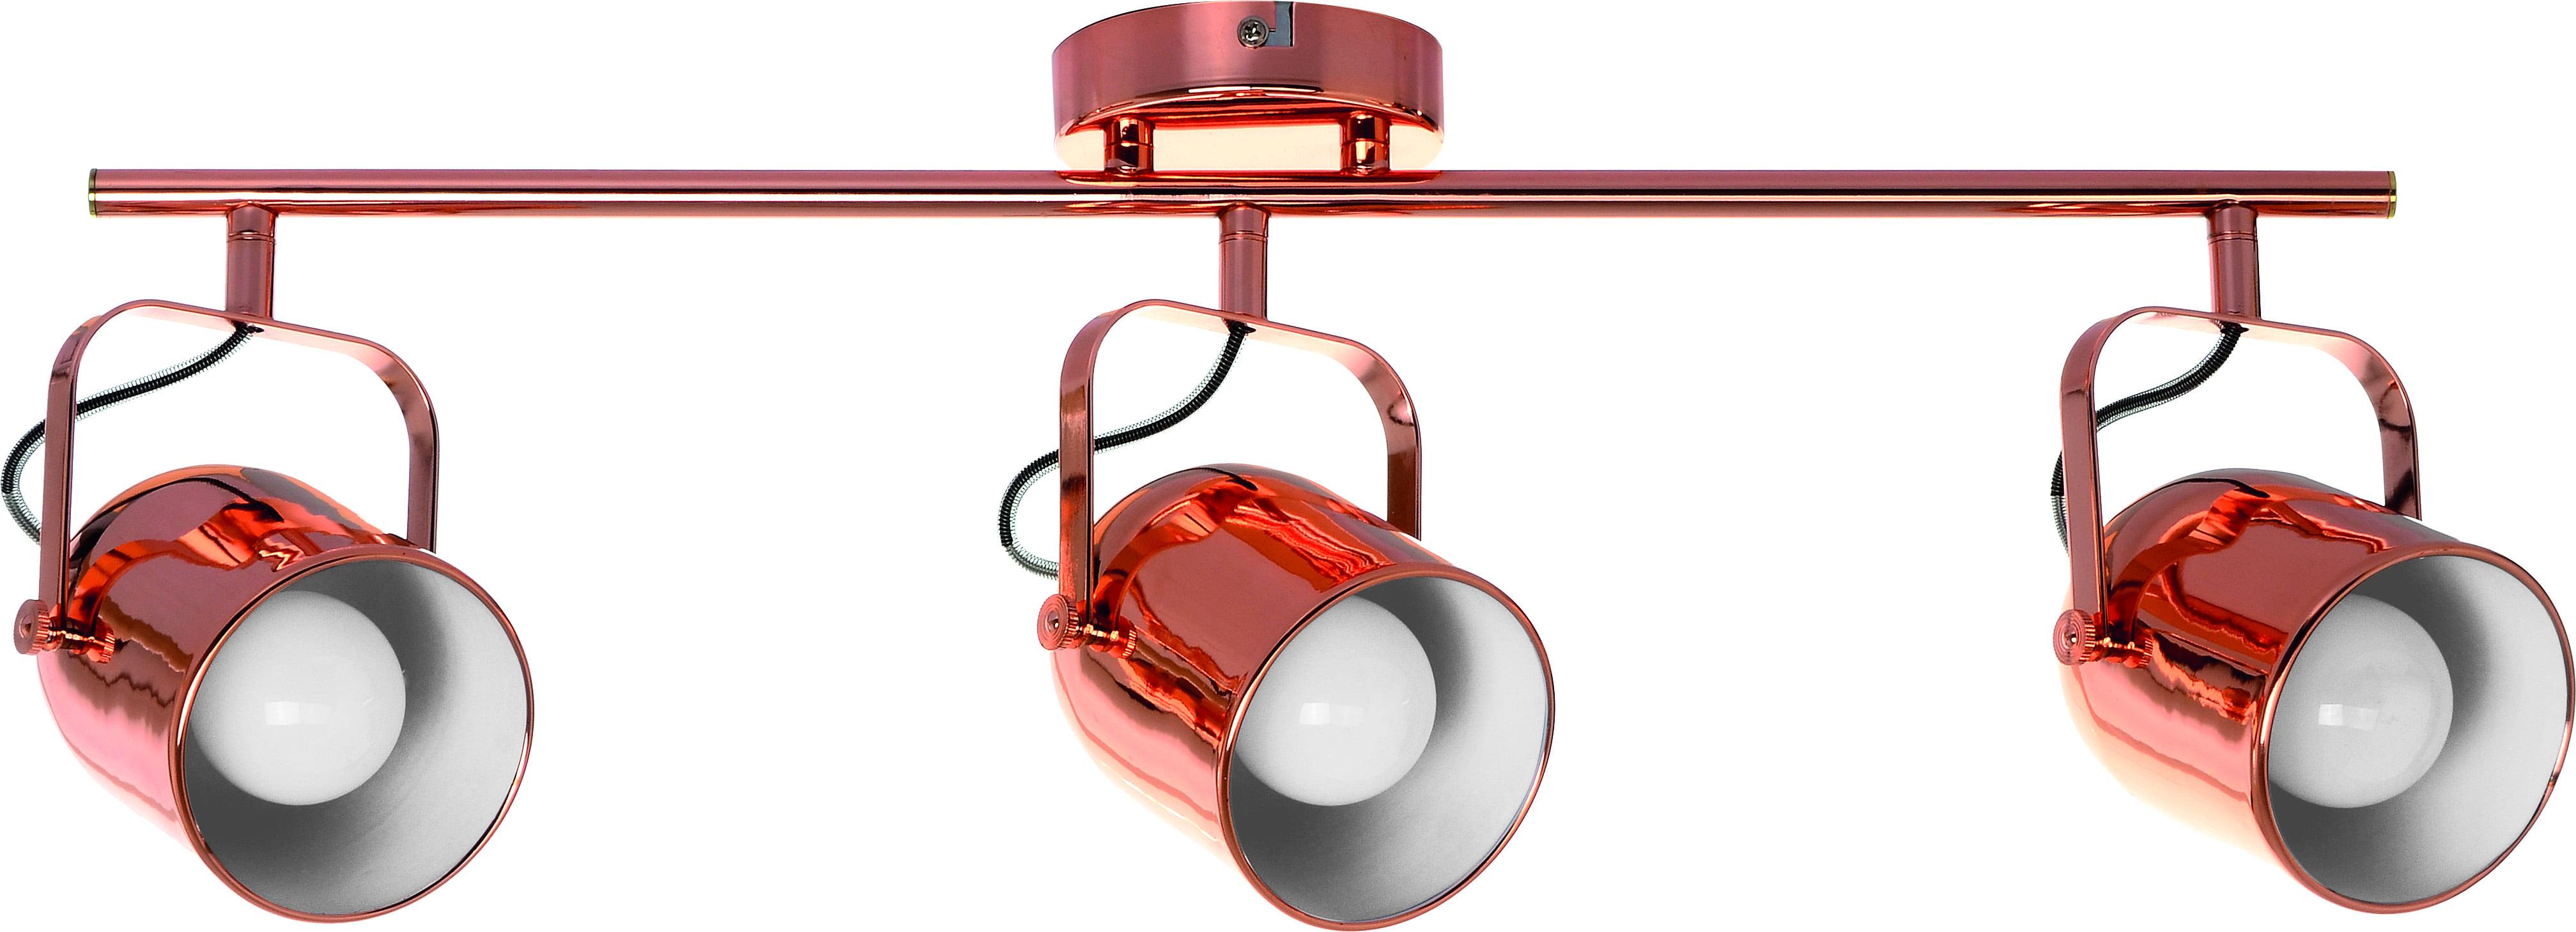 Spotlights Inga 3-point strip in Copper Color E27 60W